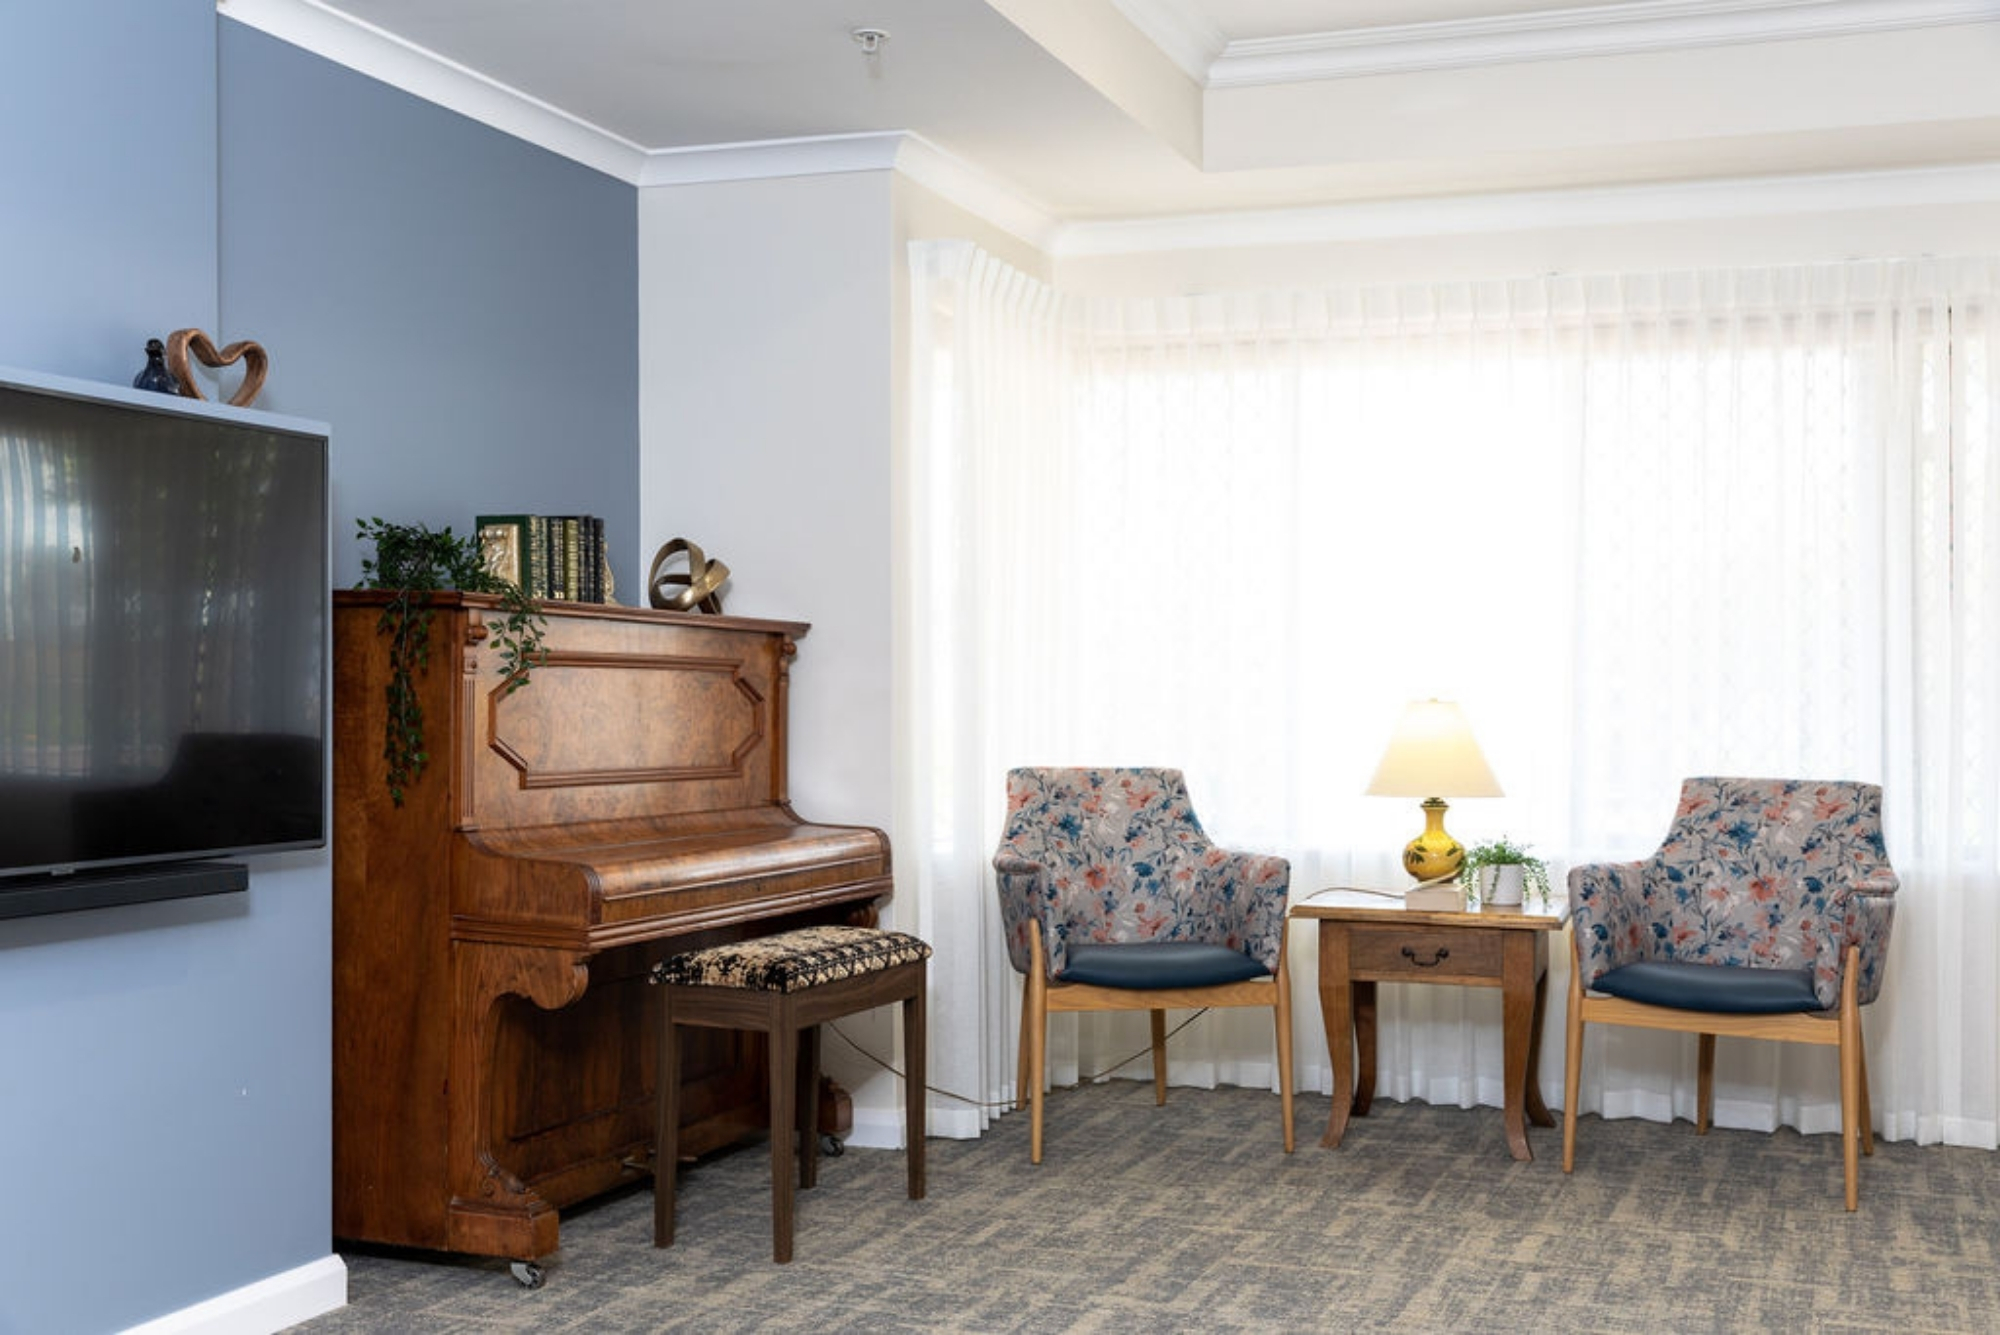 Brightwater Madeley, Madeley WA 6065 - 1-brightwater-madeley-lounge-piano